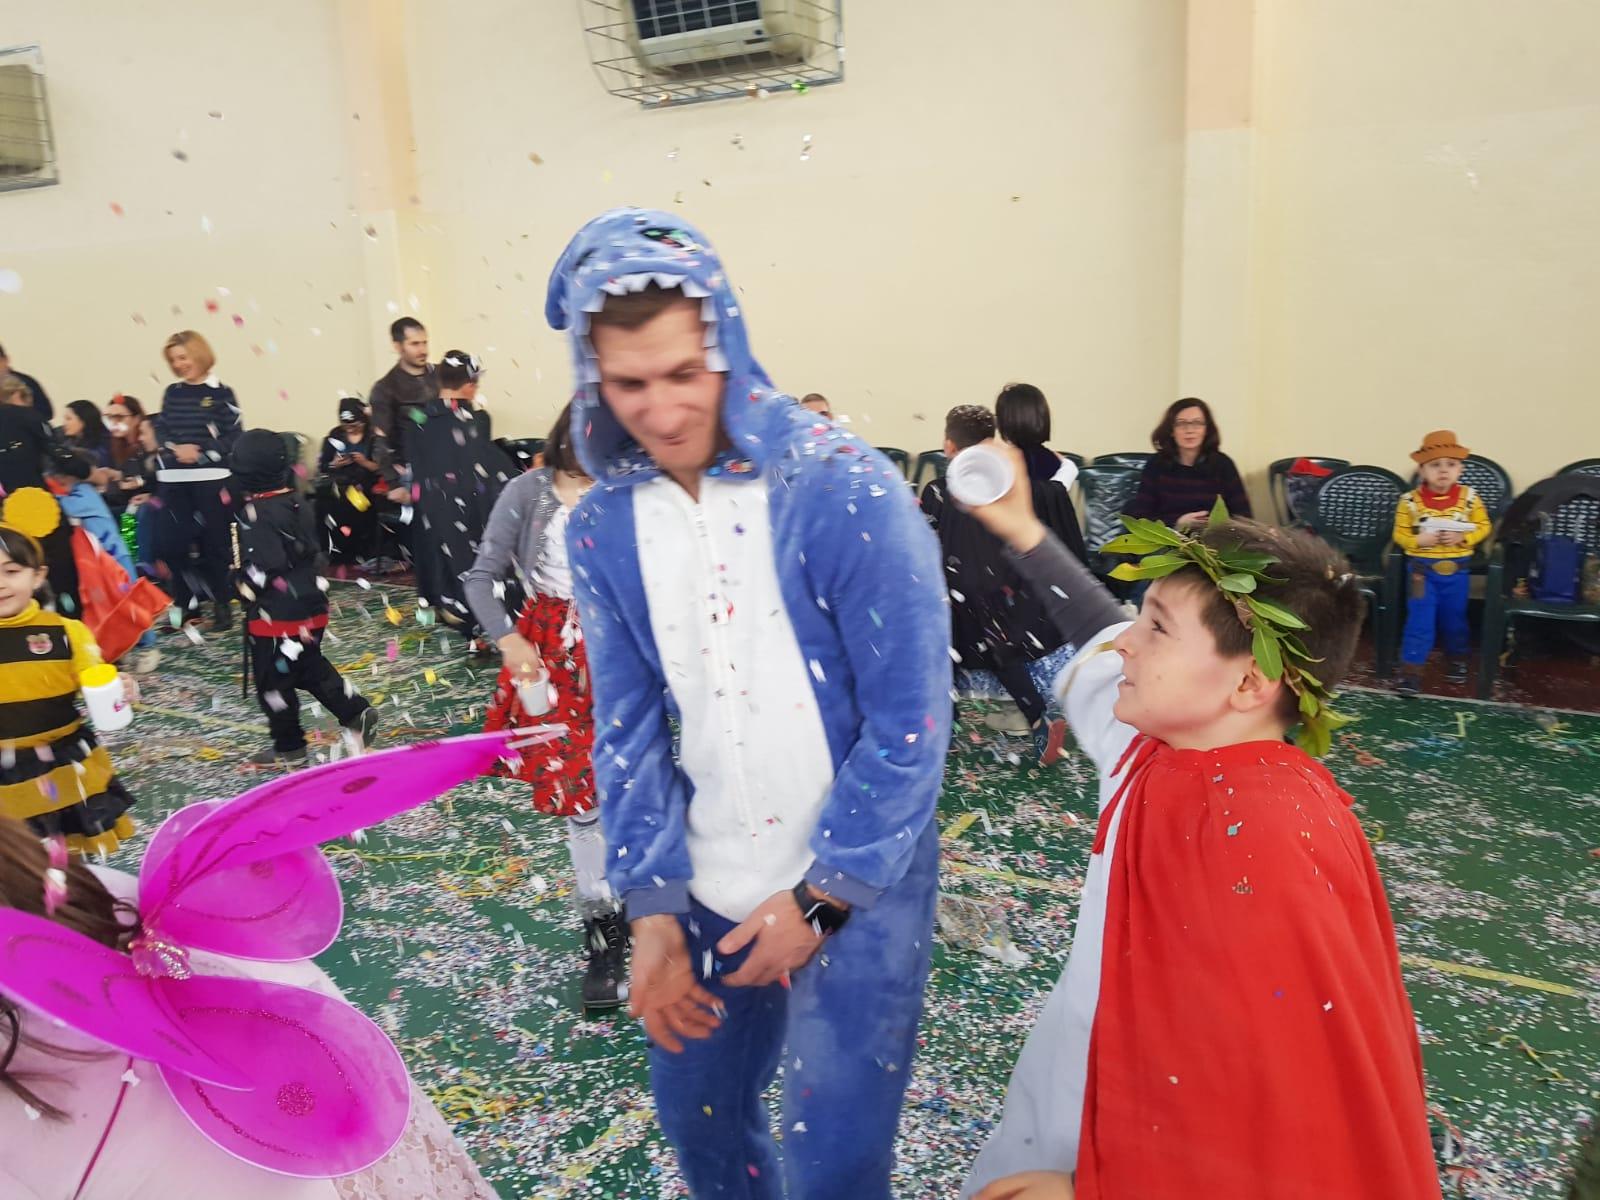 Baraonda Carnevale 2019 (145)